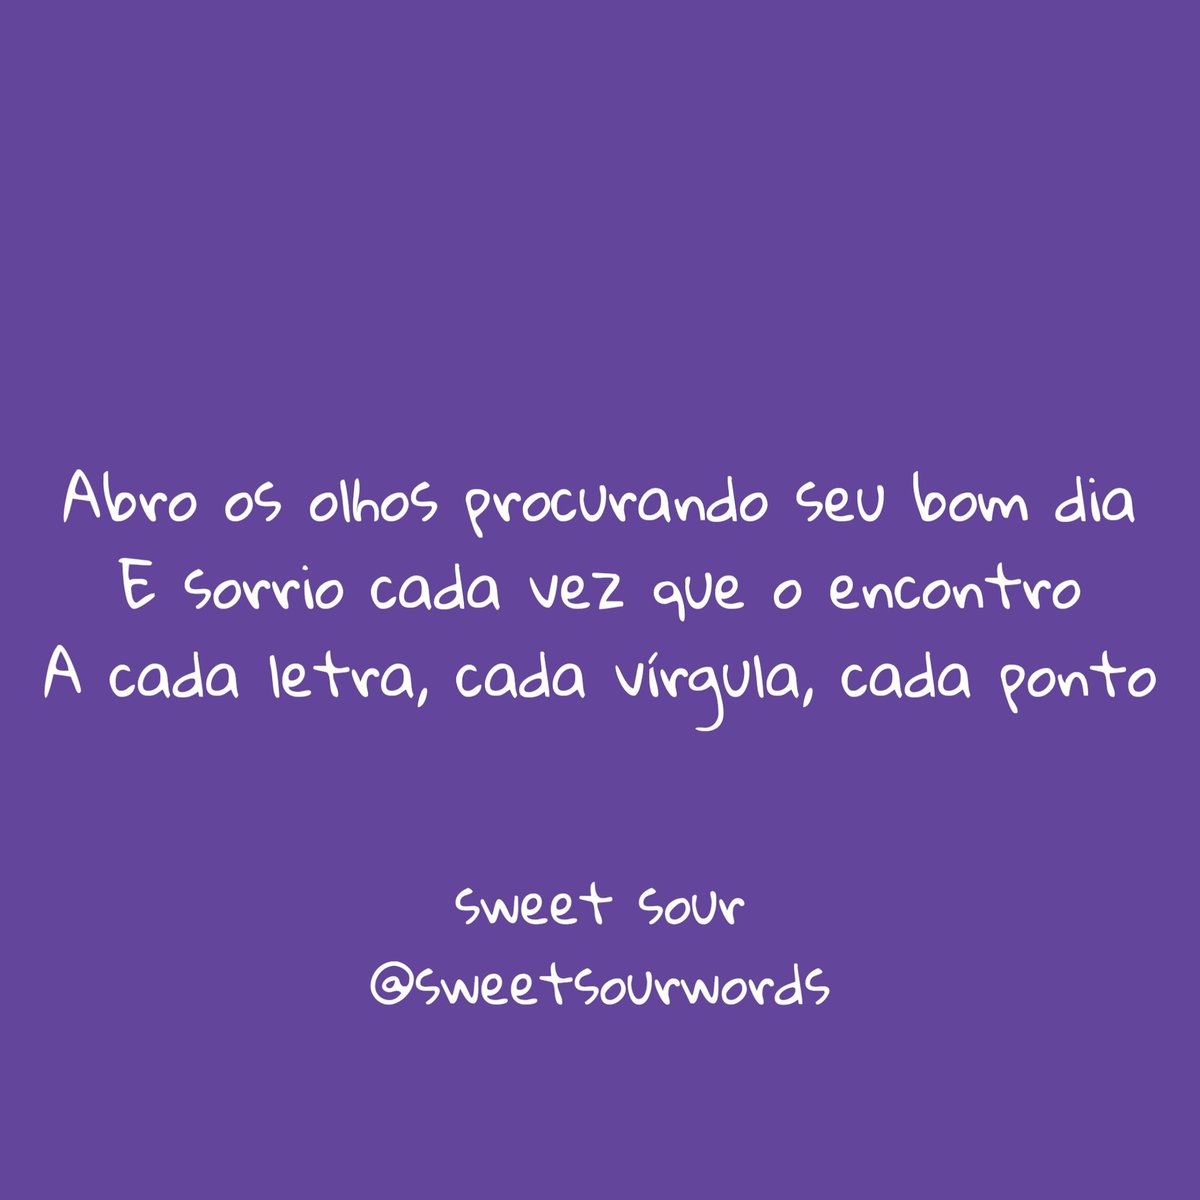 #poesia #poema #poesiasdeamor #poemasdeamor #frases #frasesdeamor #poetas #leiamaismulheres #amor #pensamentos #versos #poesiabrasileirapic.twitter.com/Vyi0qFEmqJ